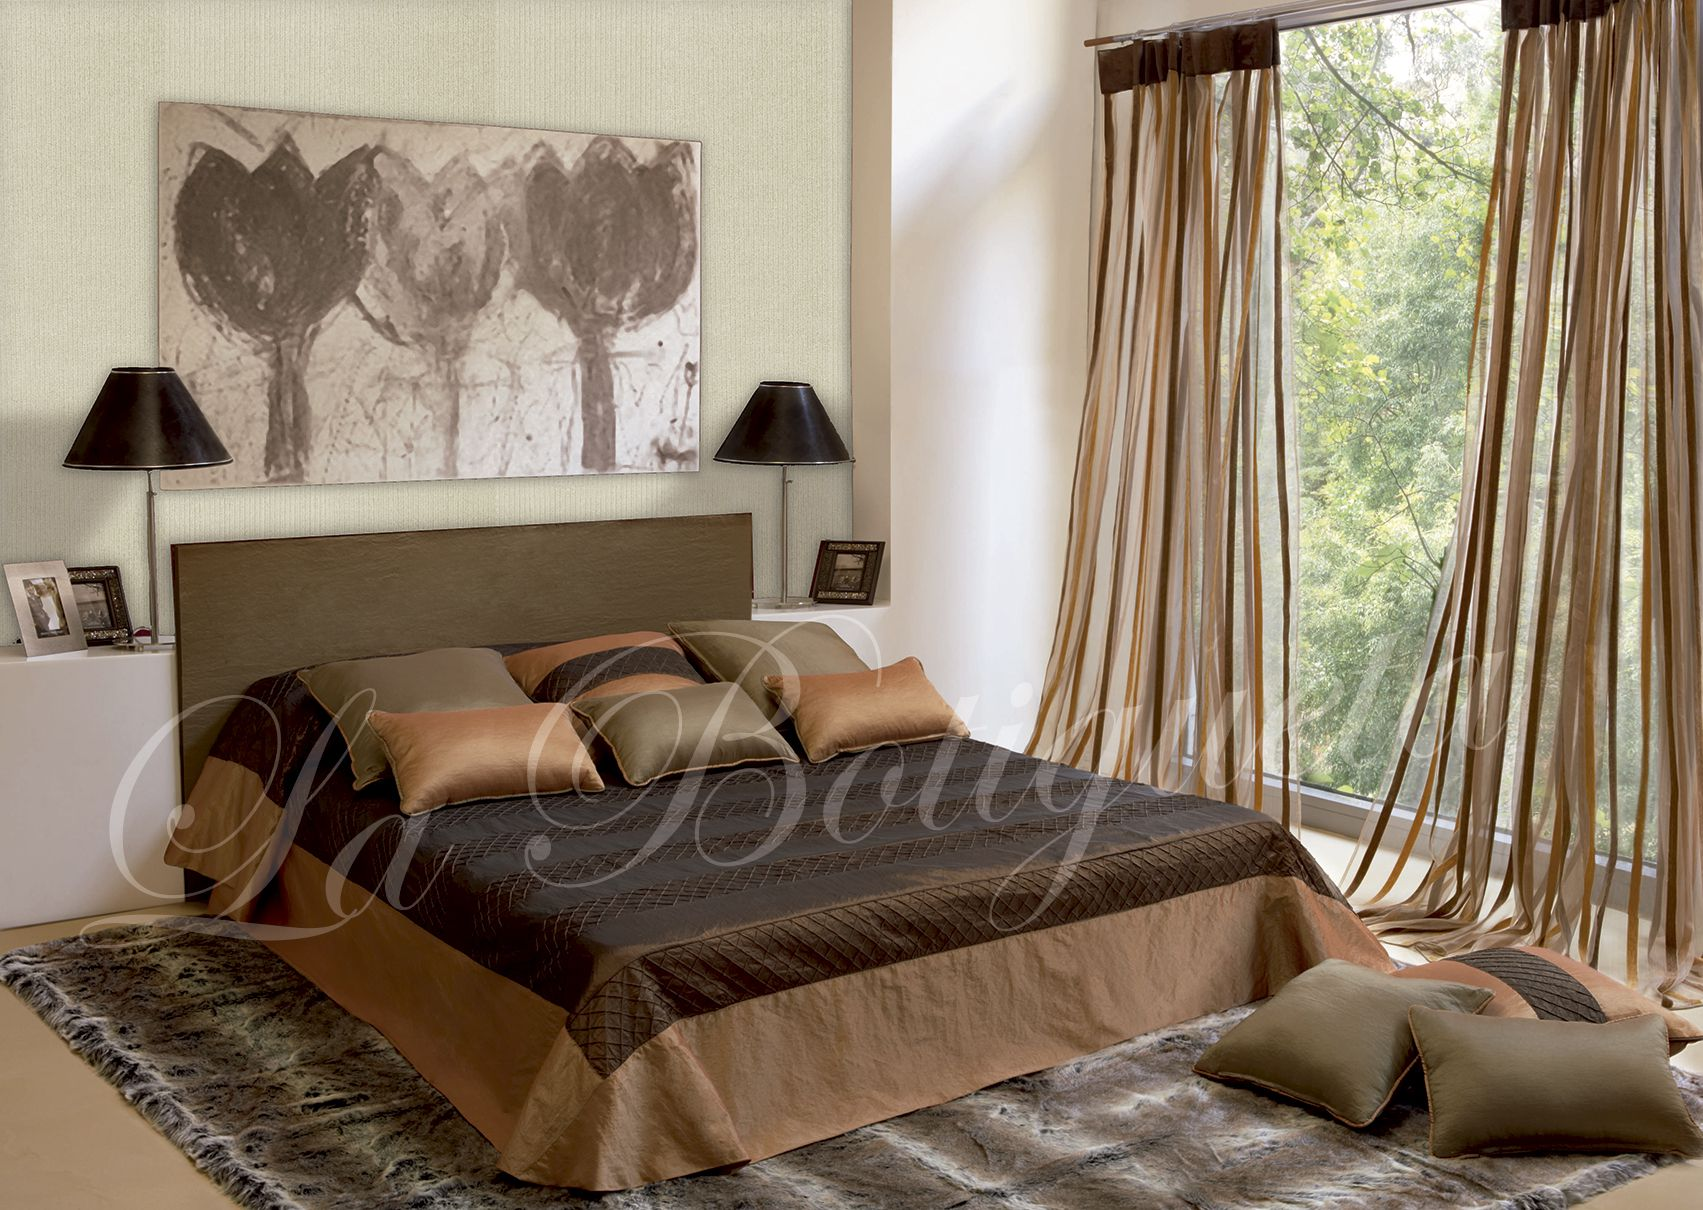 Estor dormitorio matrimonio diferentes tipos de cortinas - Estores dormitorio matrimonio ...